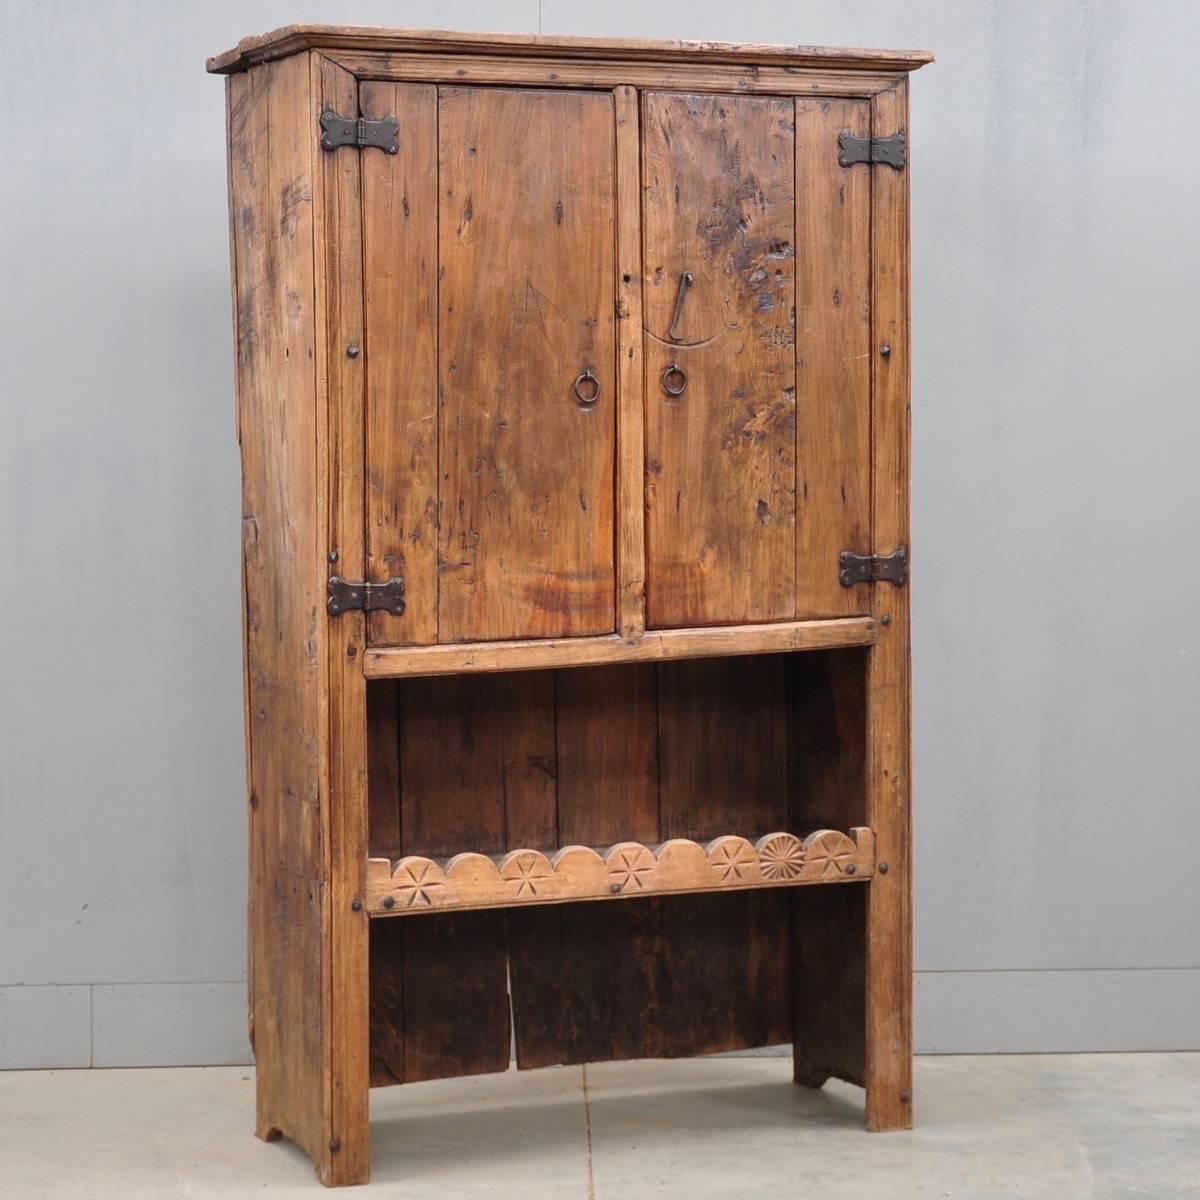 Rustic Spanish Cupboard De Grande Antique Furniture